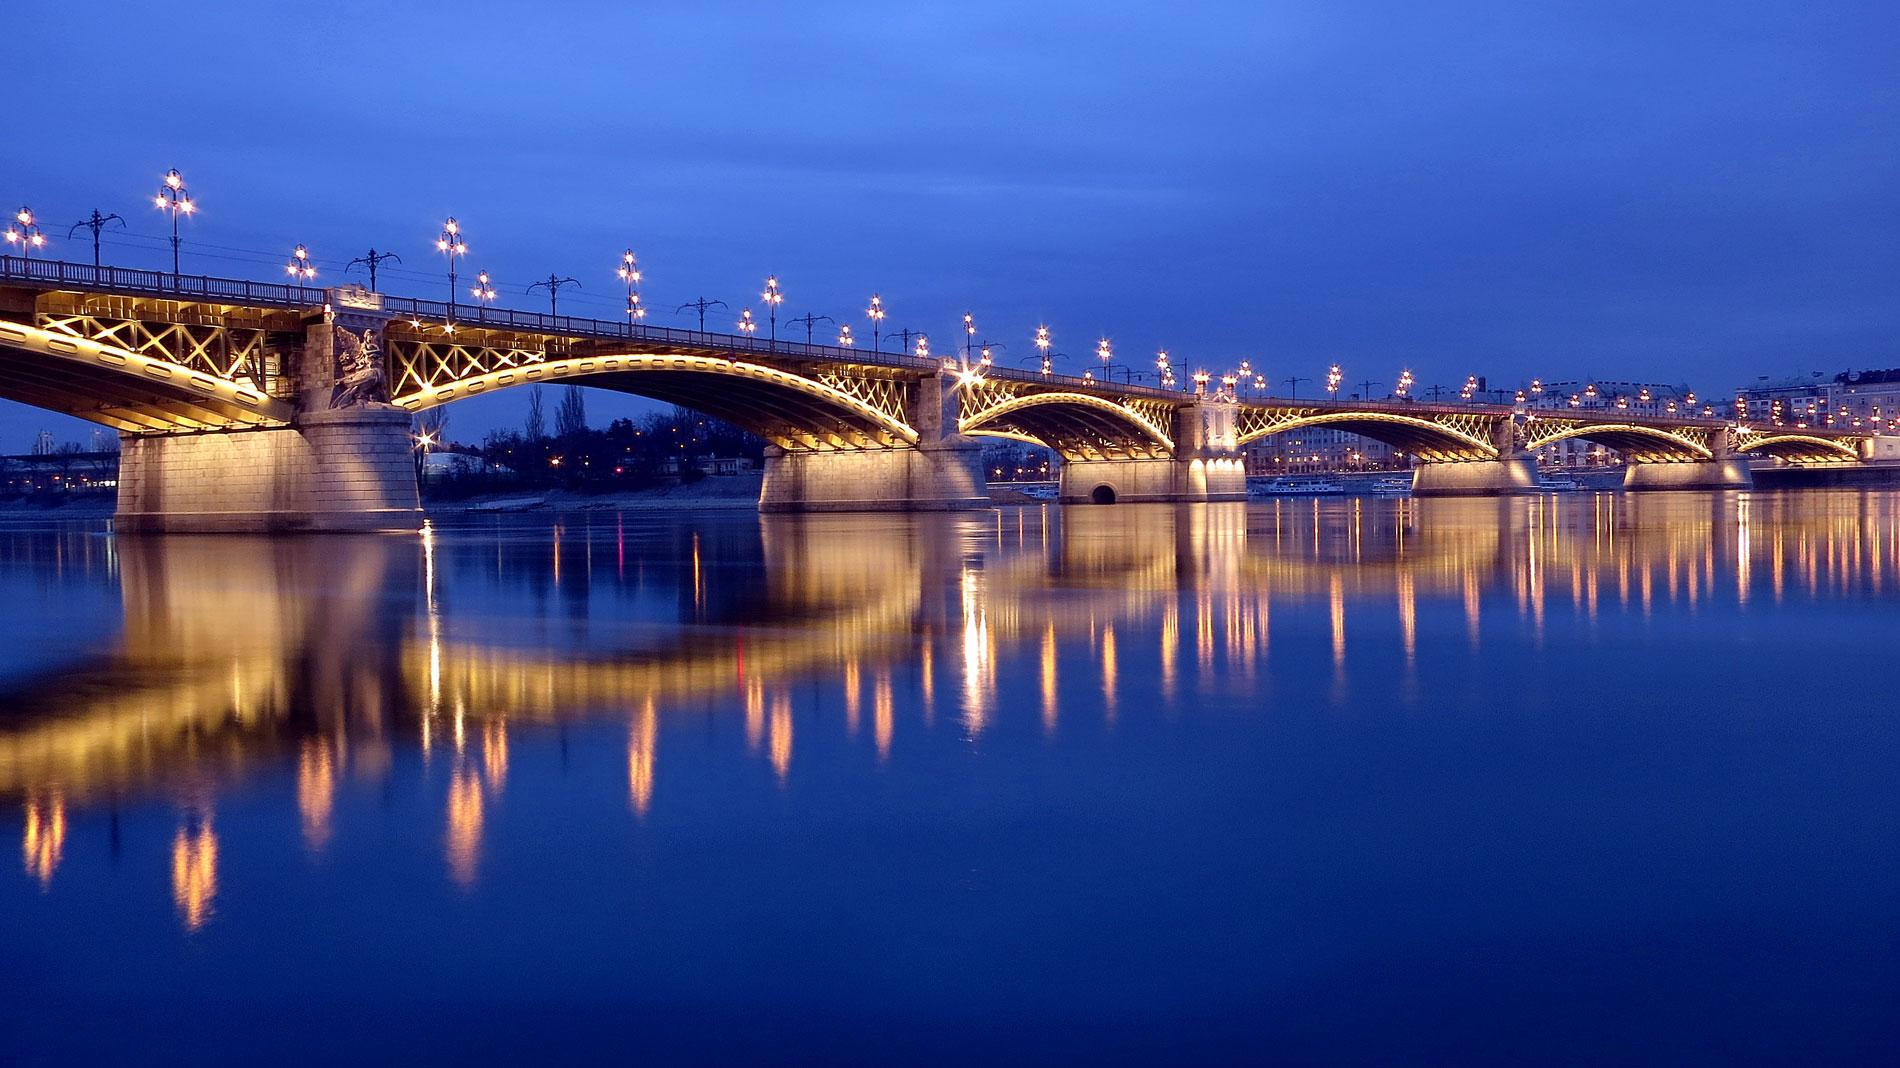 budapest_atthary_photography_bridge_38